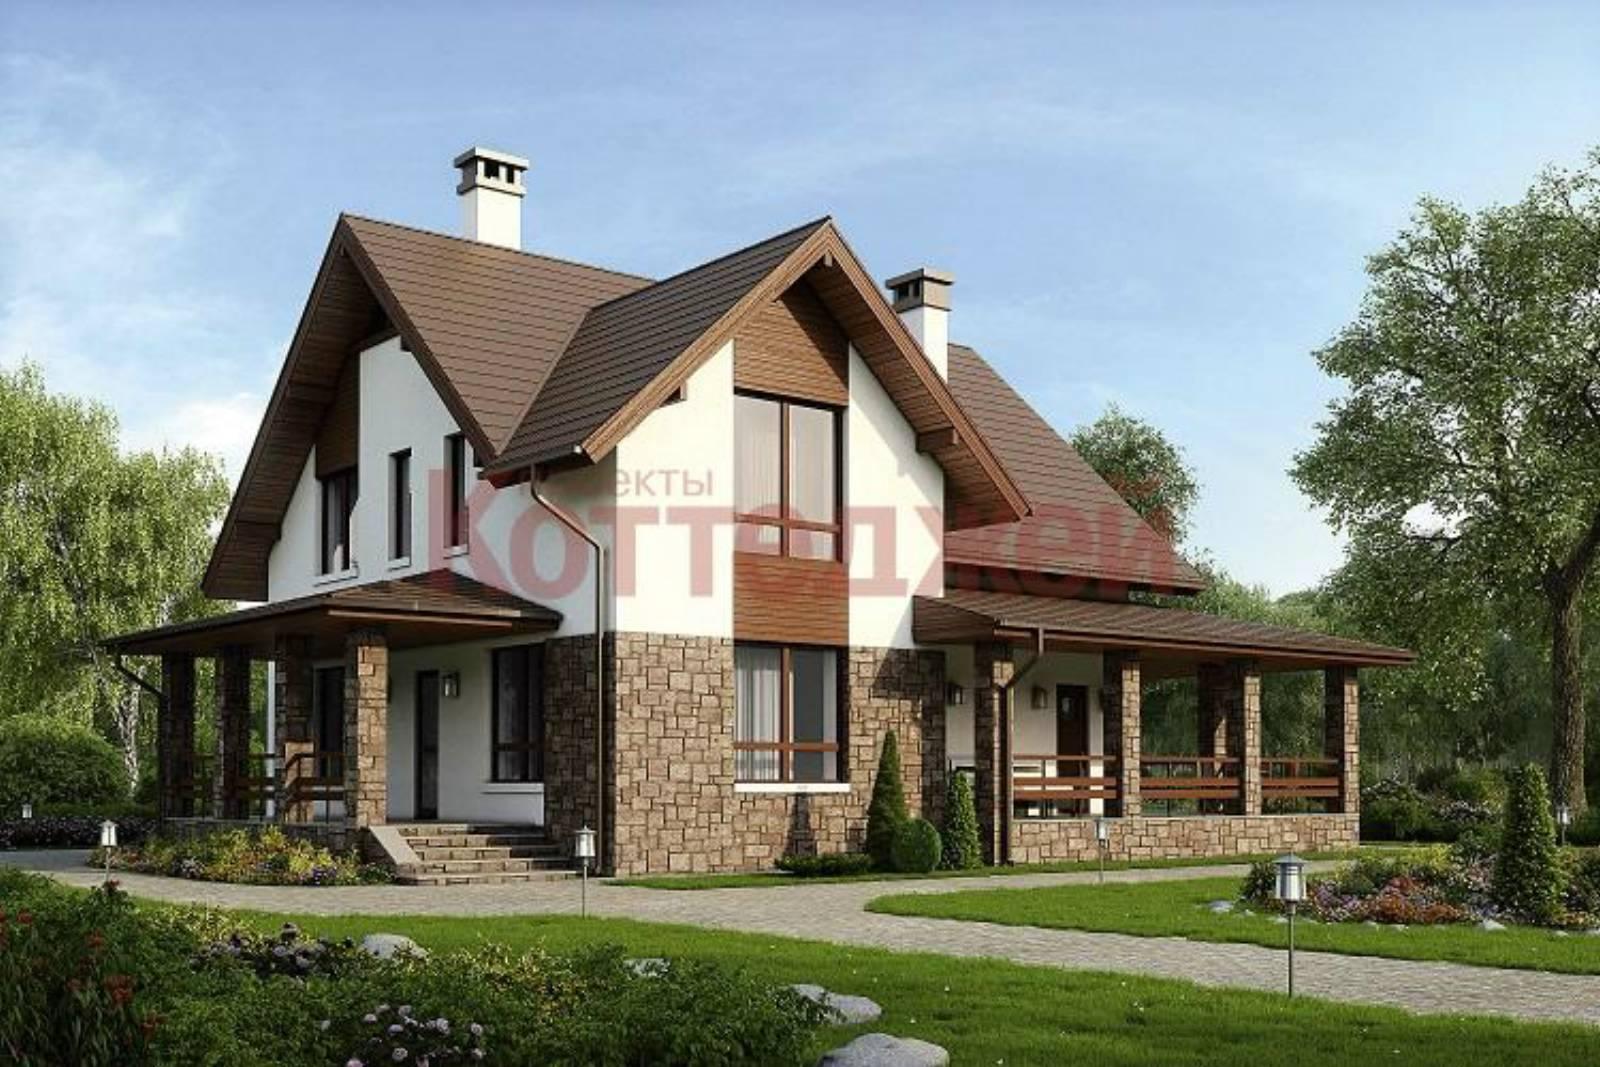 Проект 59-62k - жилой дом.